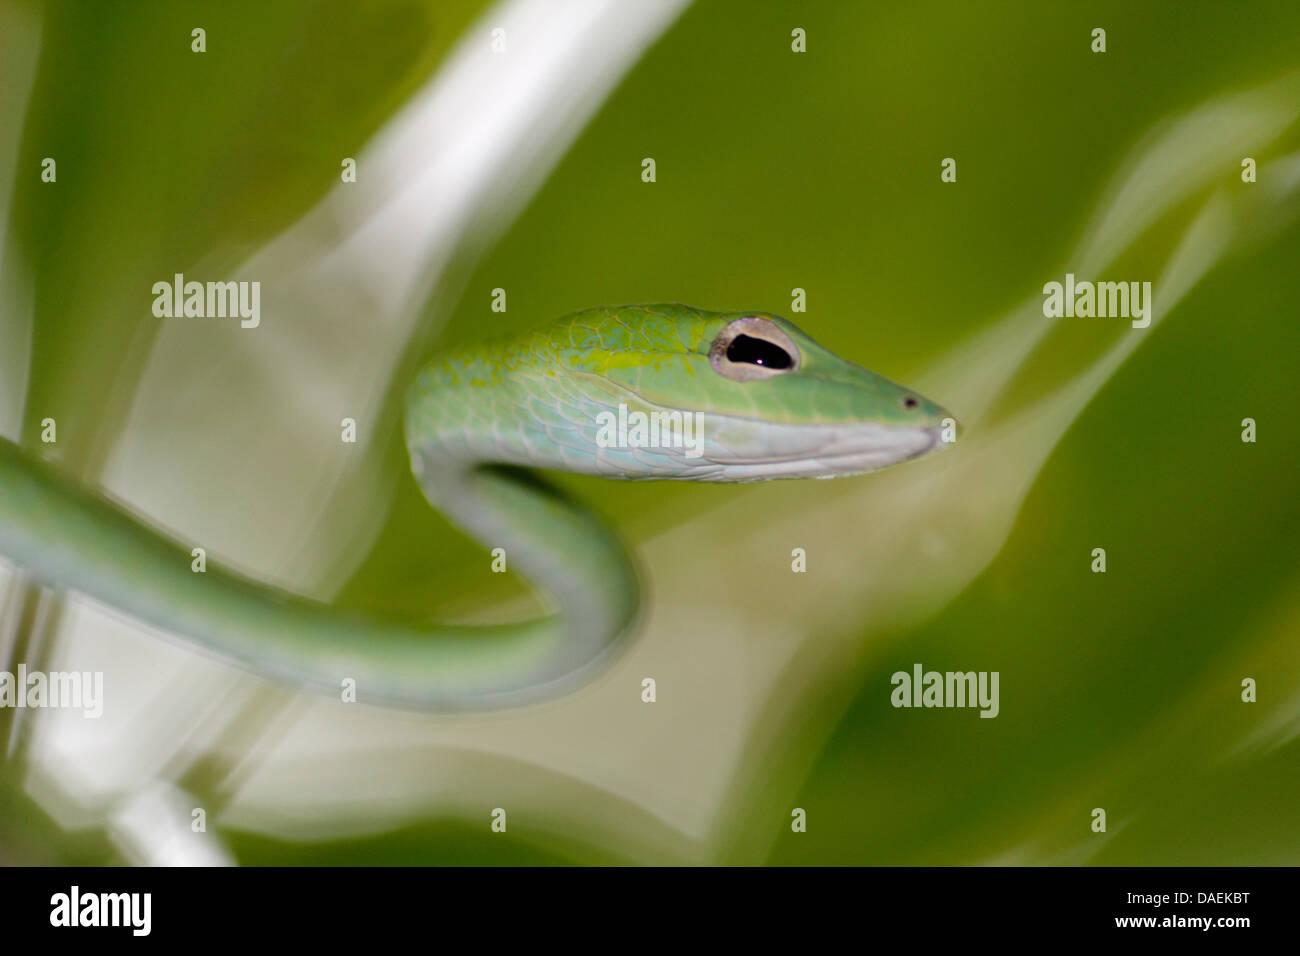 long-nosed tree snake, long-nosed whipsnake, Oriental whipsnake (Ahaetulla prasina), the snake crowls through a tree, Thailand, Khao Lak National Park Stock Photo